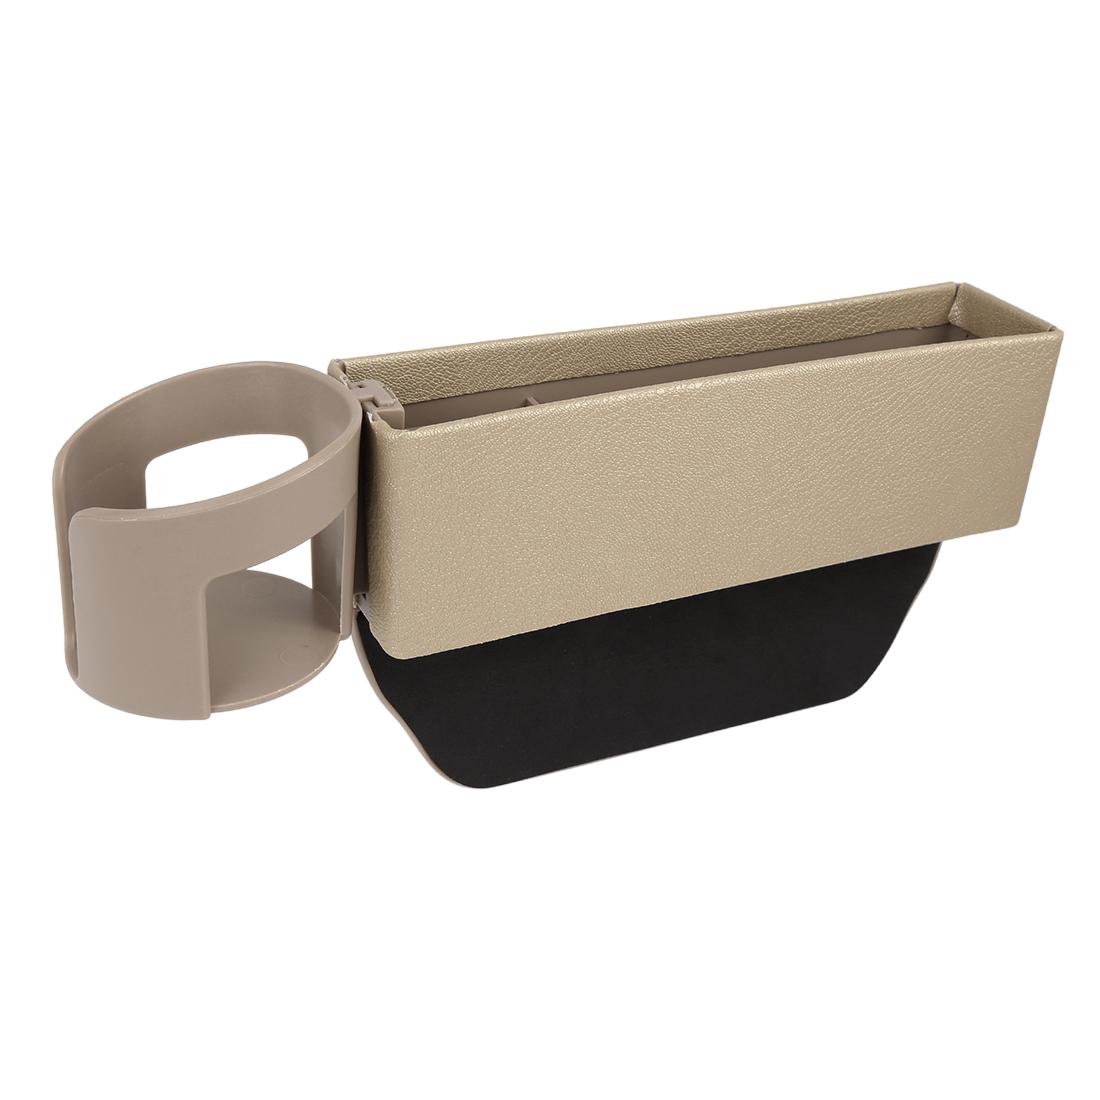 Beige PU Leather Car Seat Crevice Storage Driver Passenger Side Gap Organizer